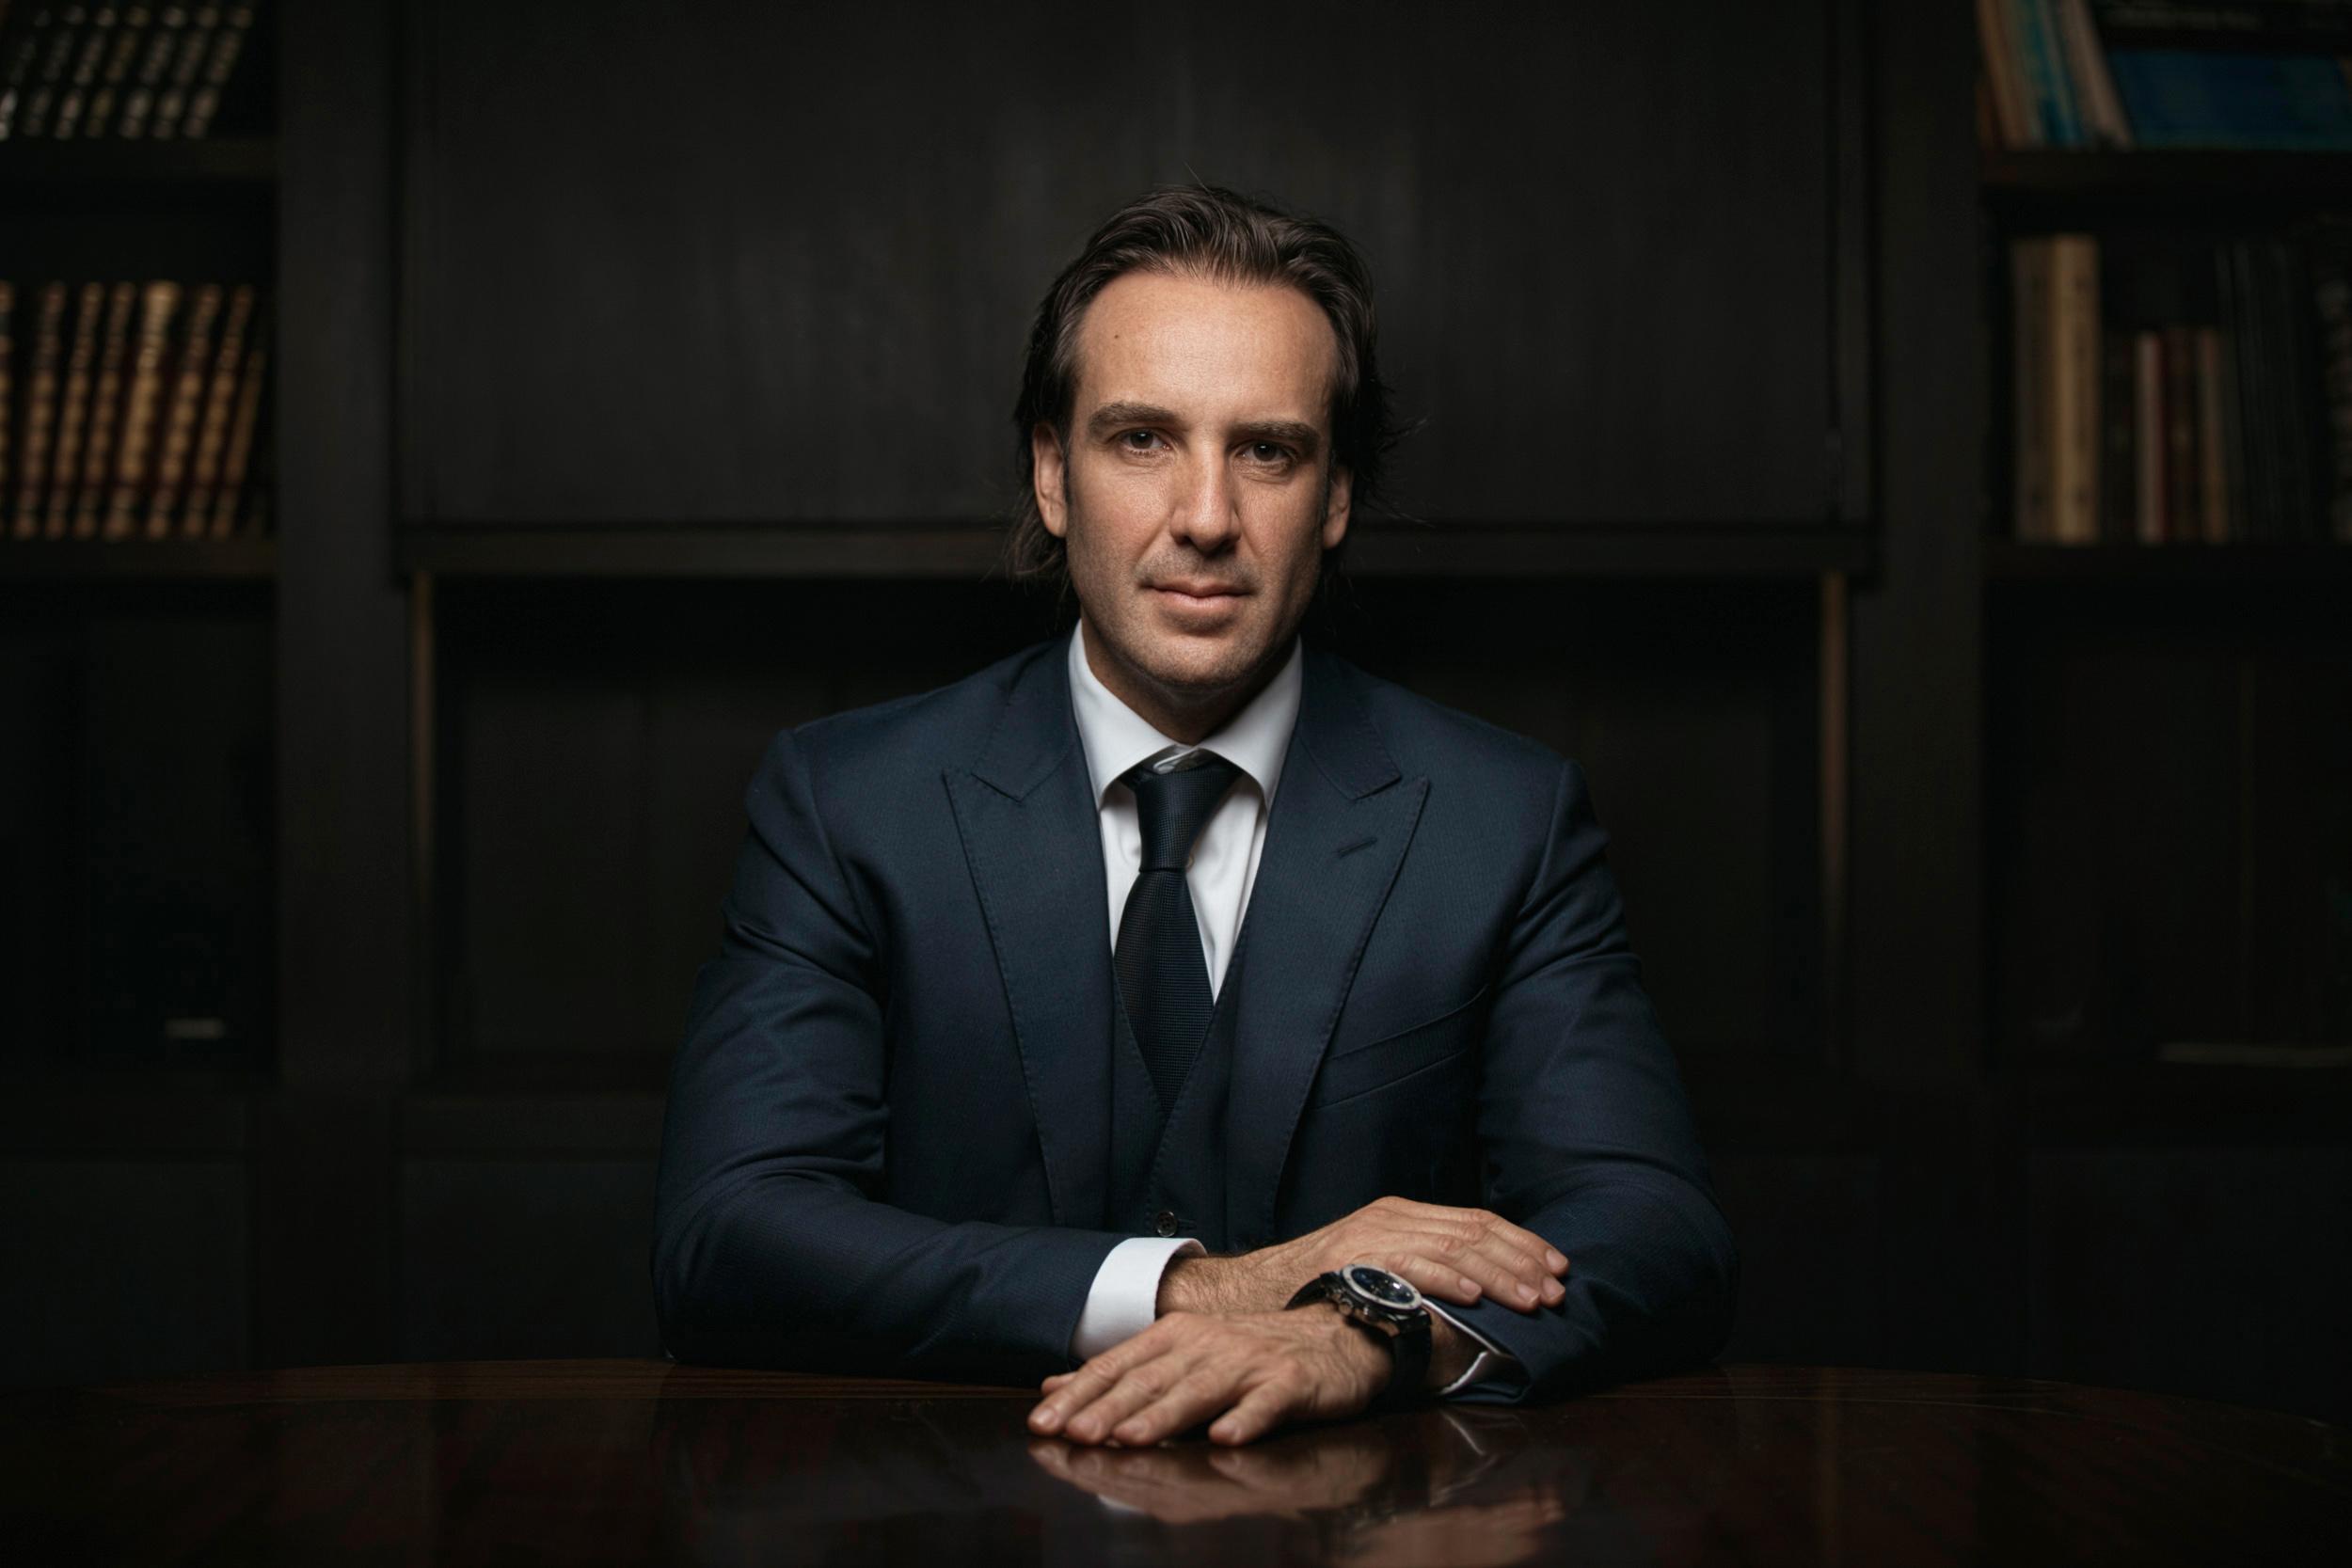 Alejandro - Corporate Portrait